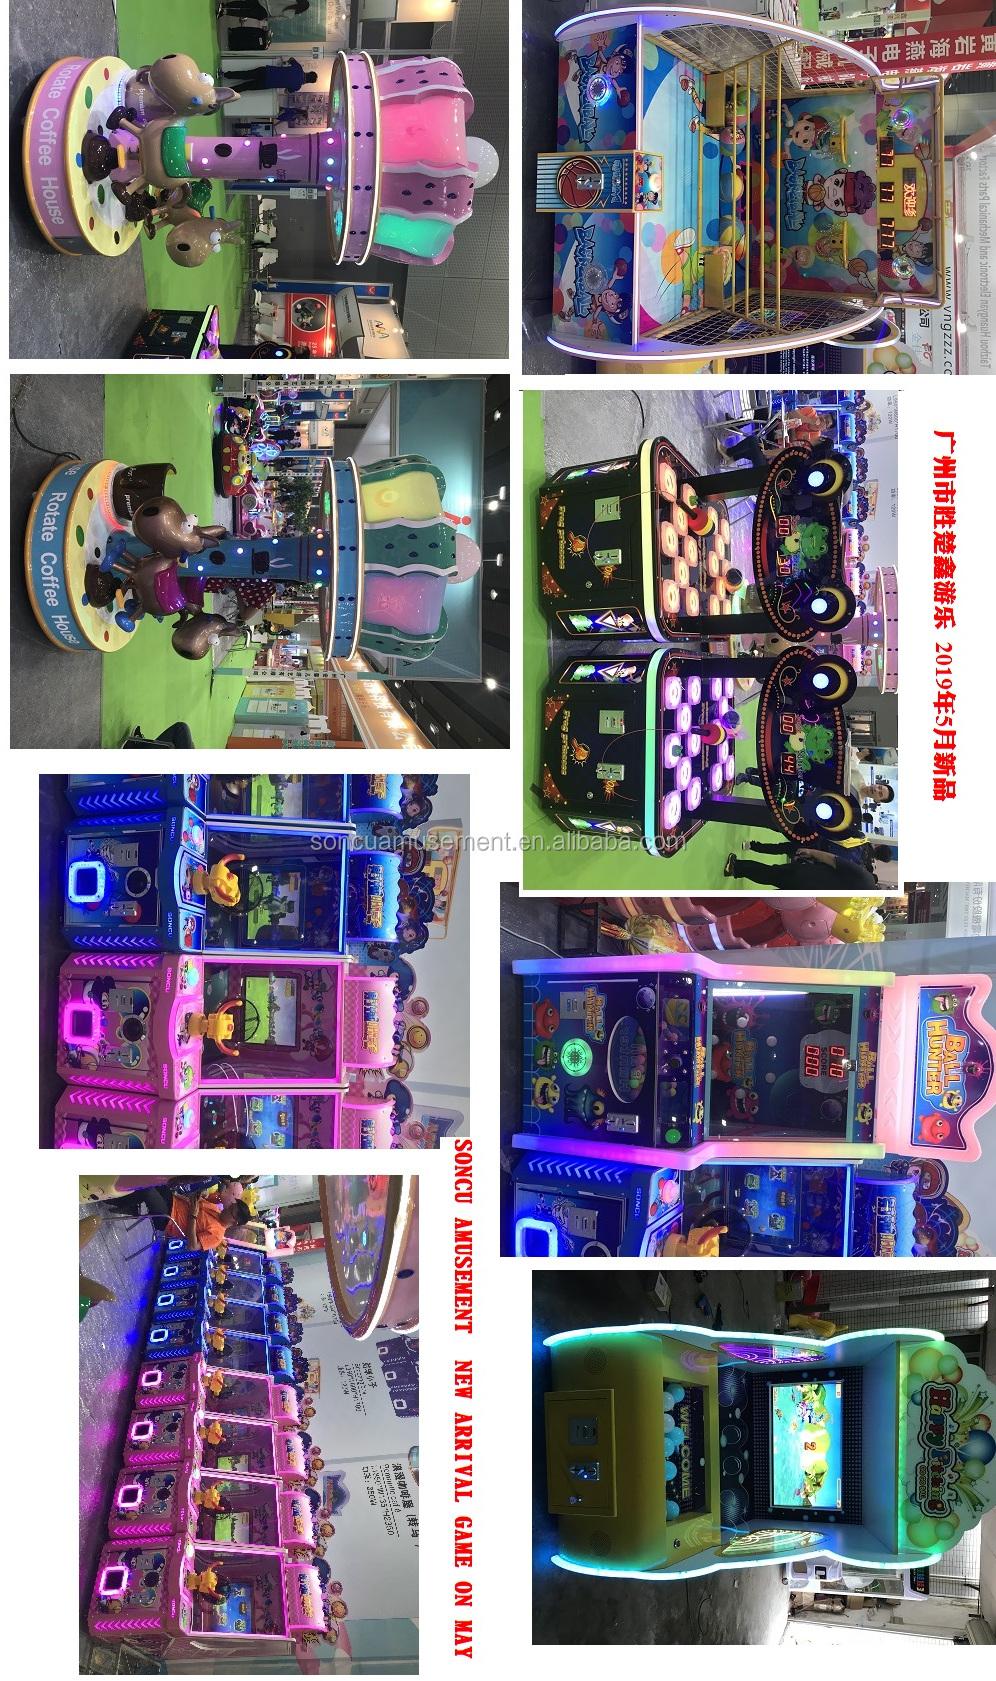 New children's happy pitching machine and playing lottery game machine